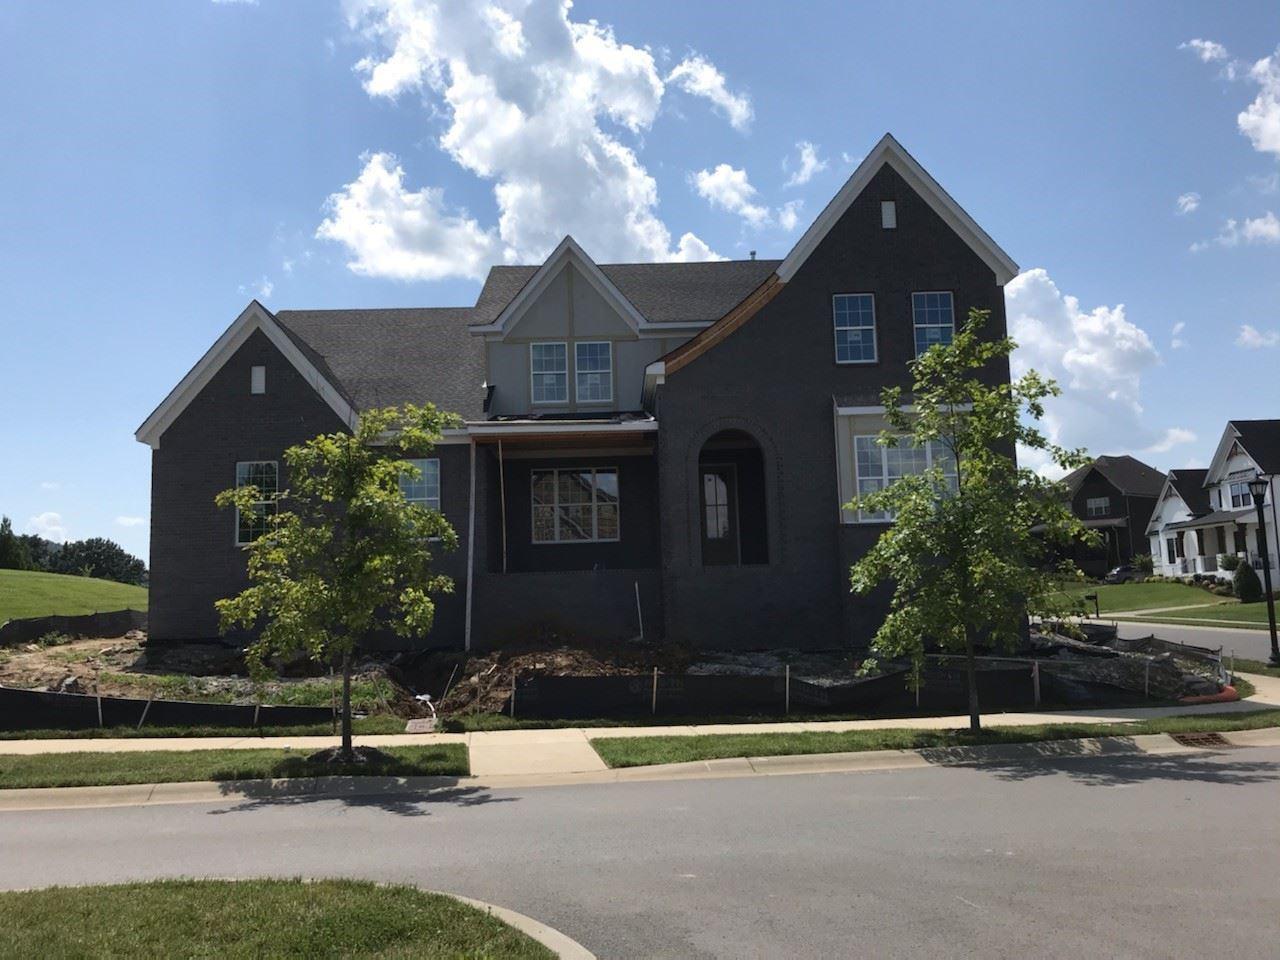 997 Quinn Terrace, Nolensville, TN 37135 - MLS#: 2273850